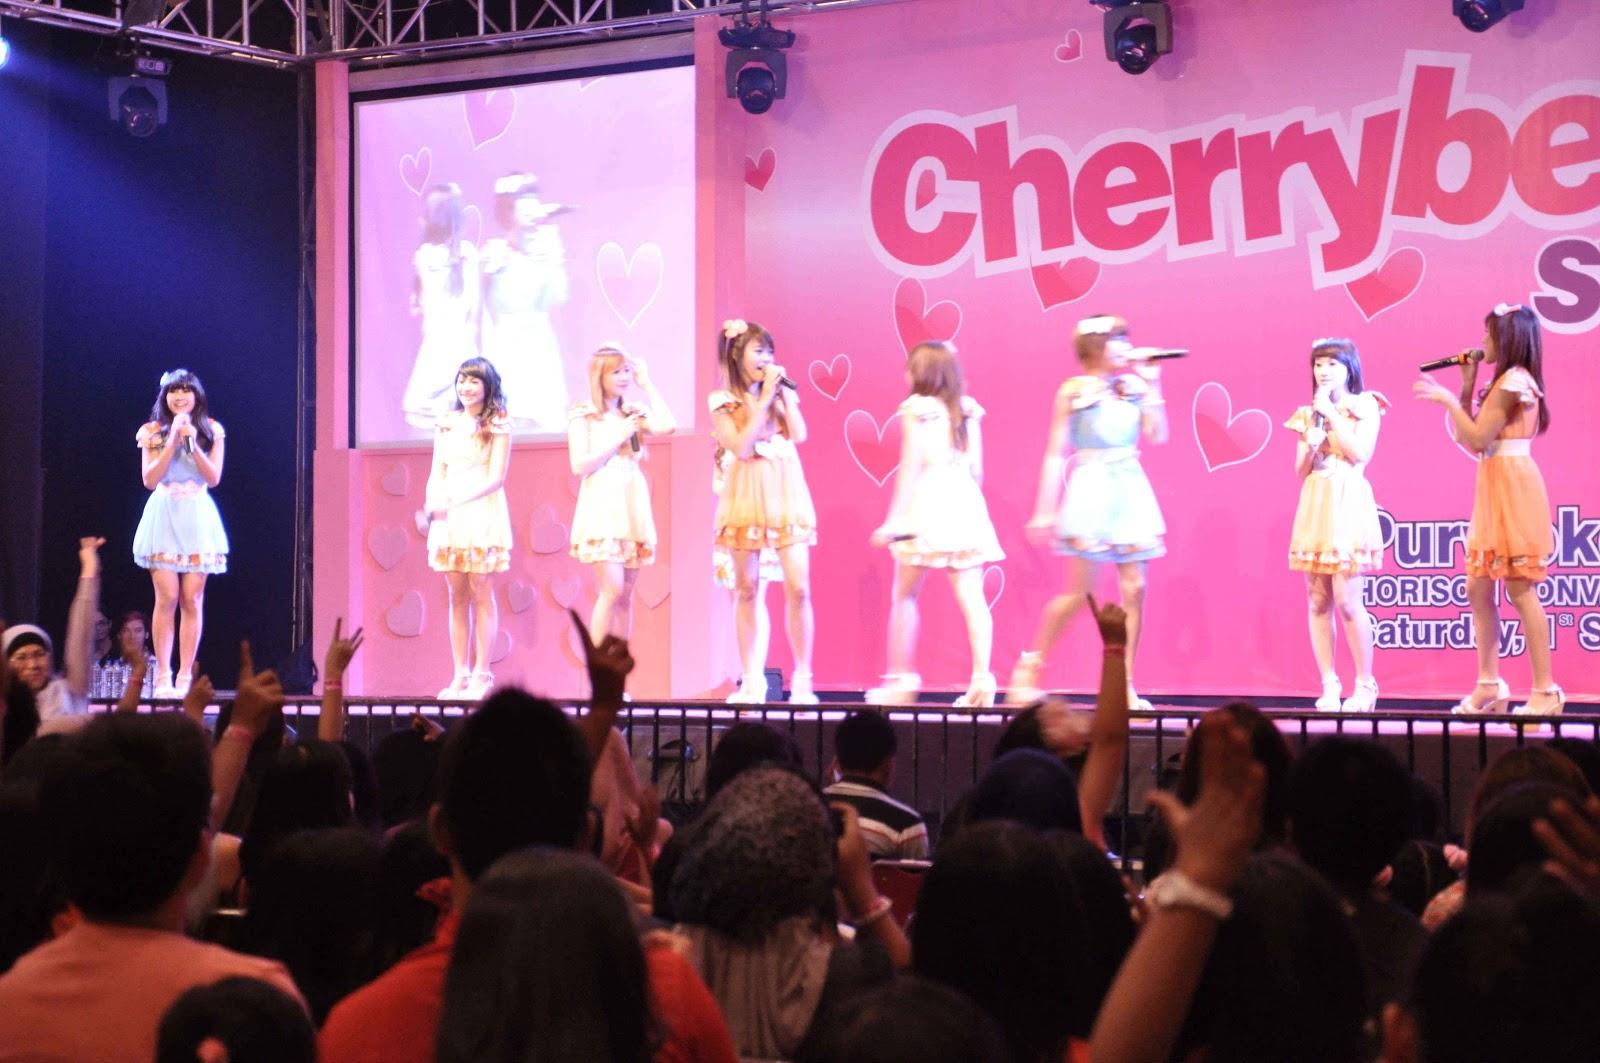 Cherrybelle In Purwokerto Photo Video Purwokerto